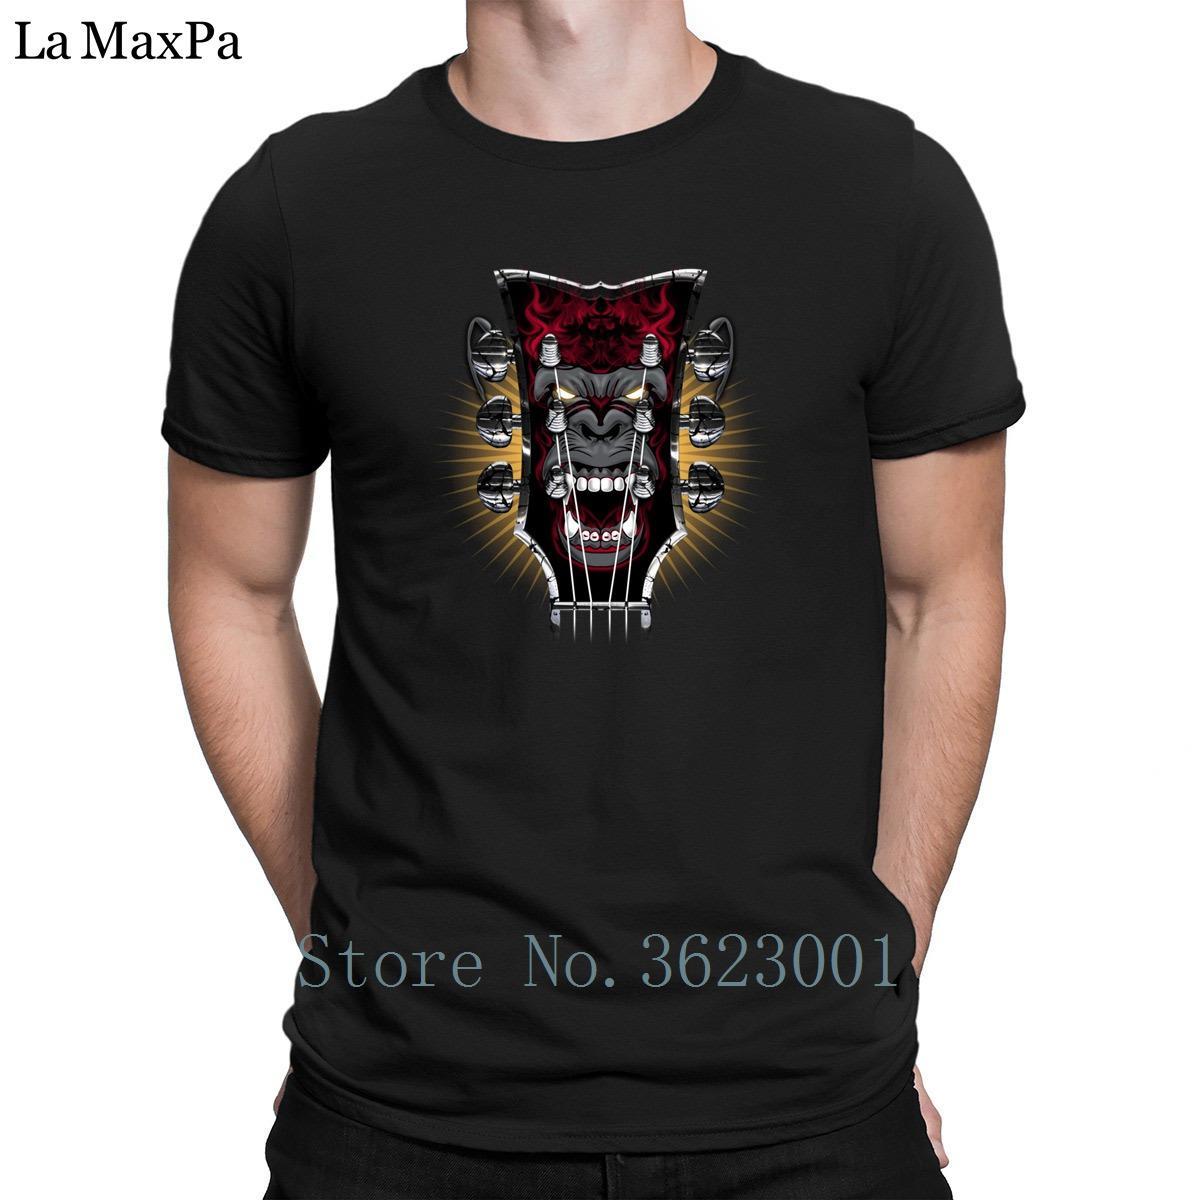 56b25a5e Custom Fit T Shirt Monkey King Guitar Head Stock Tee Shirt Short Sleeve  Solid Color T Shirt Man Original Tee Shirt Slogan Super Cool T Shirts T  Shirts ...